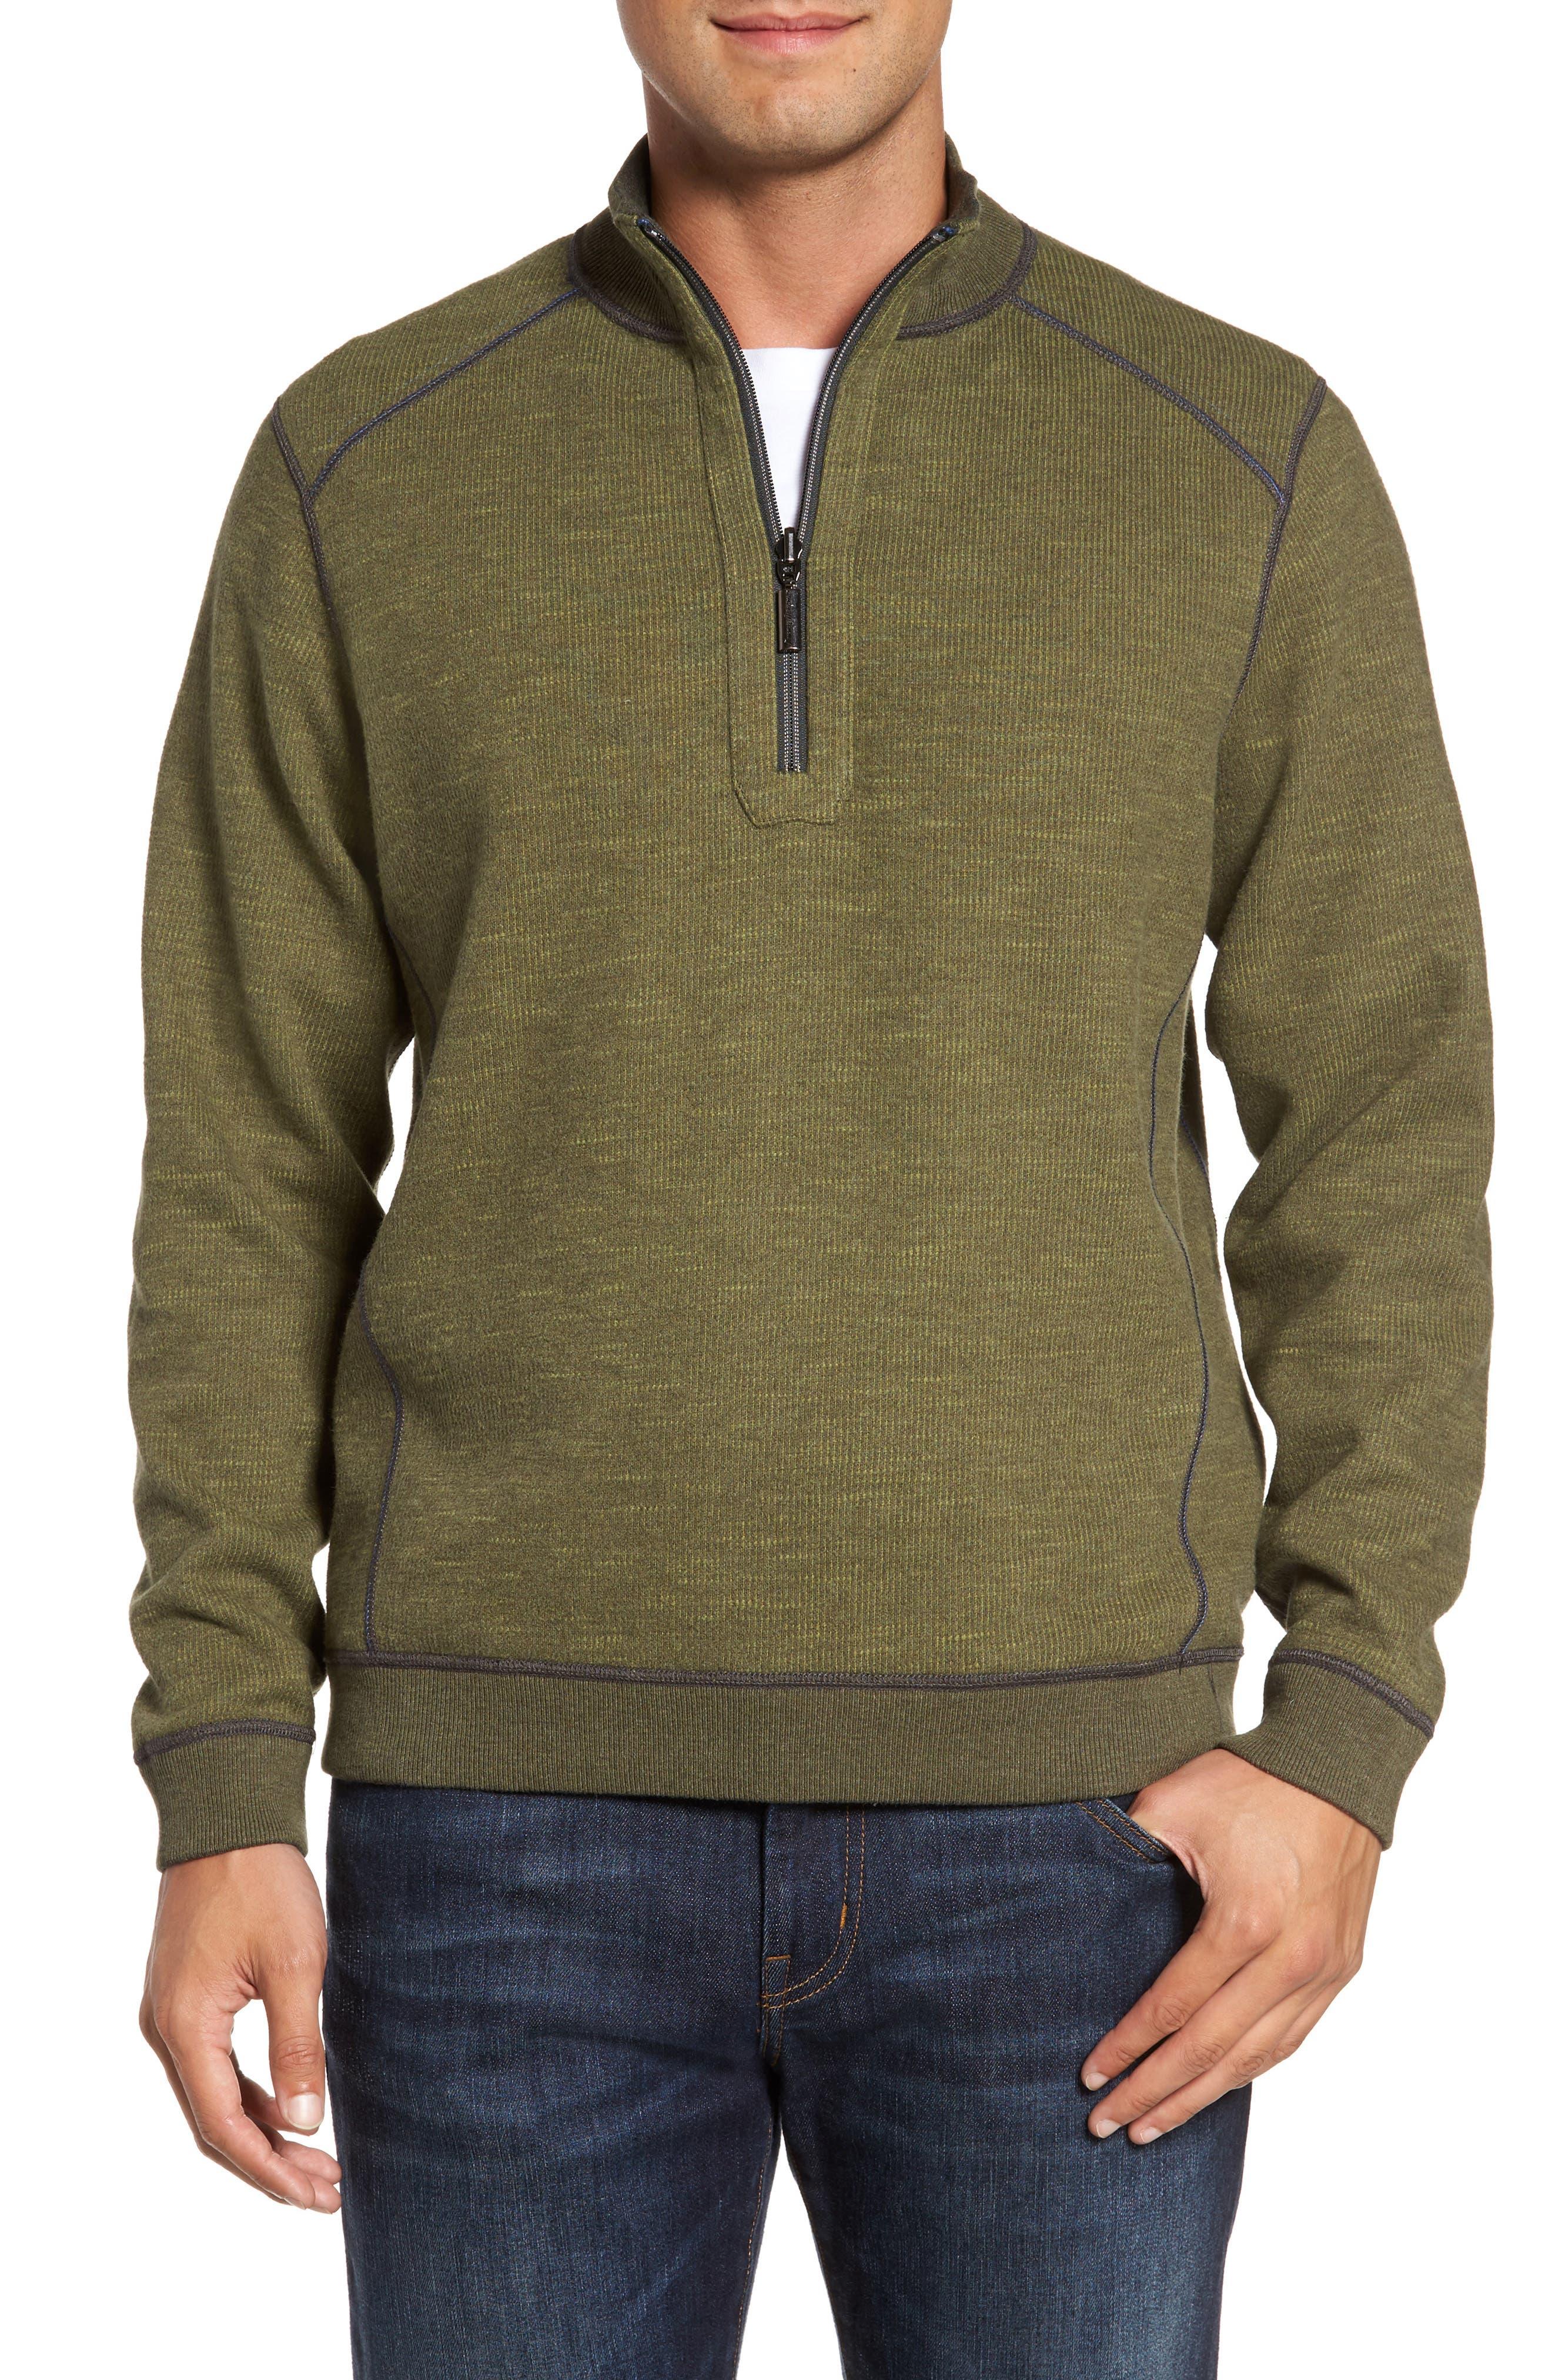 Flipsider Reversible Quarter-Zip Pullover,                             Alternate thumbnail 2, color,                             Steel Wool Heather